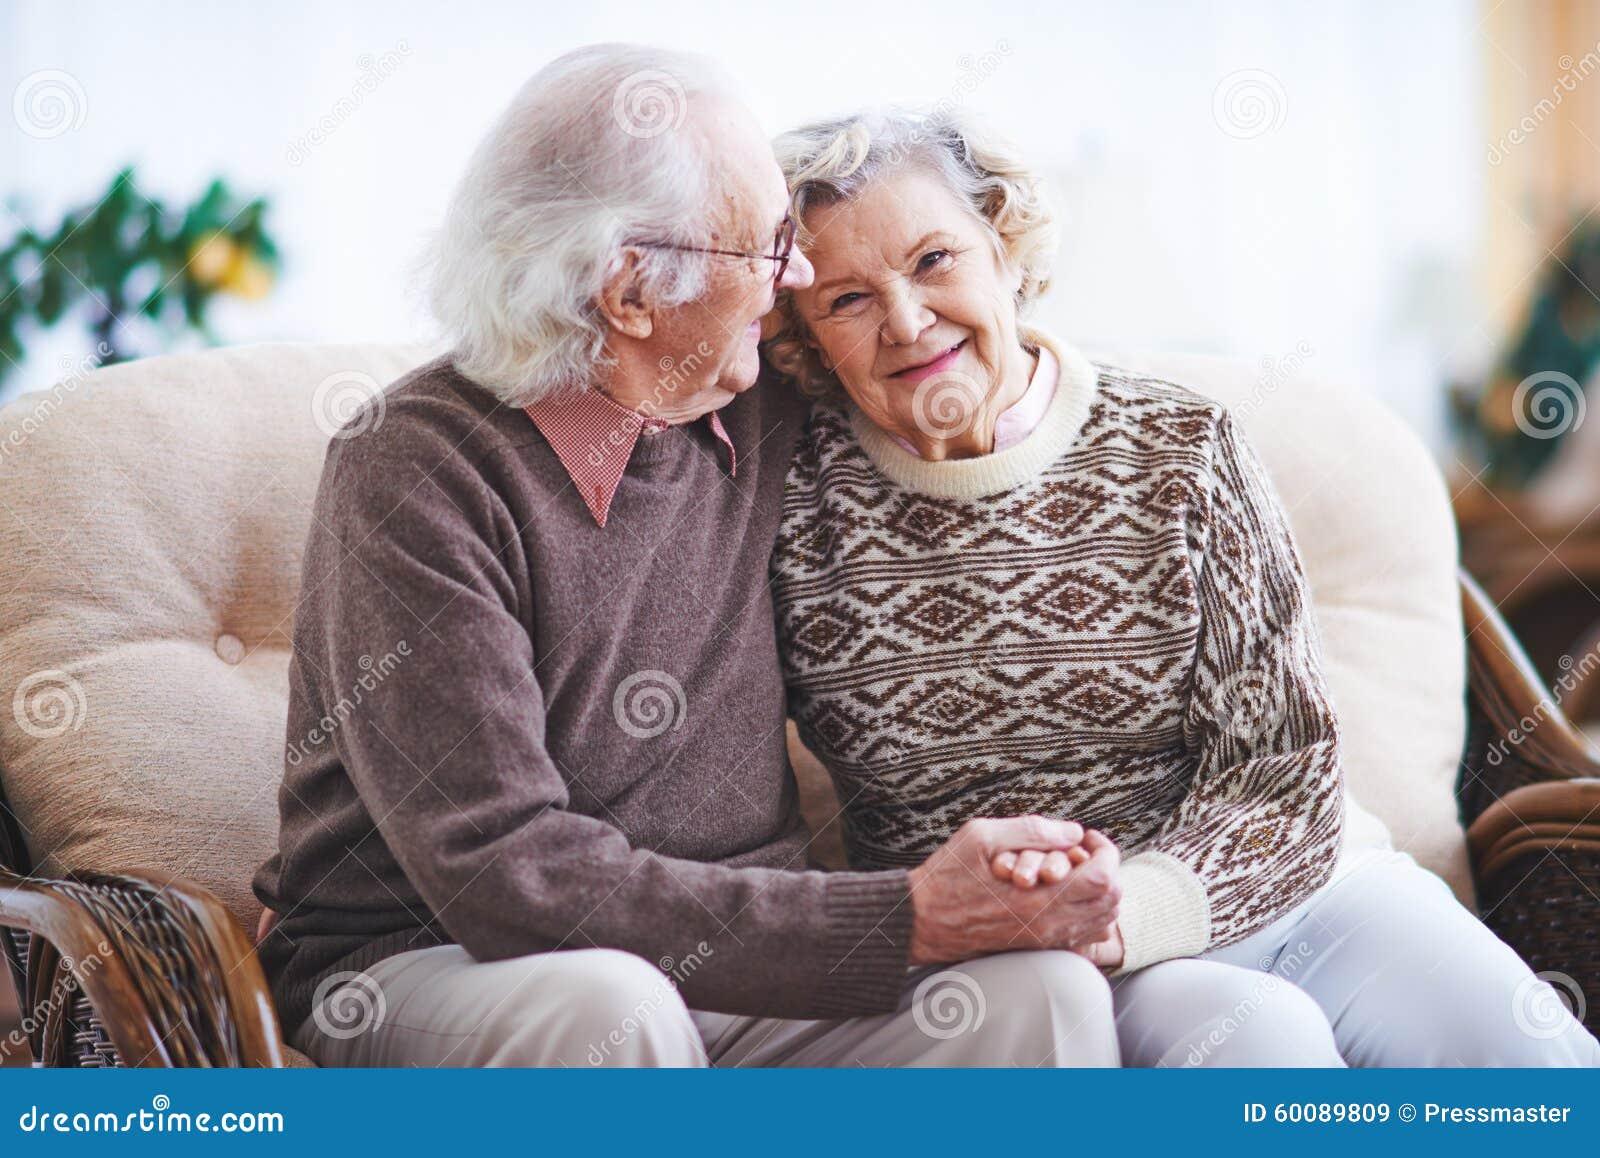 Partnersuche junge frauen ältere männer